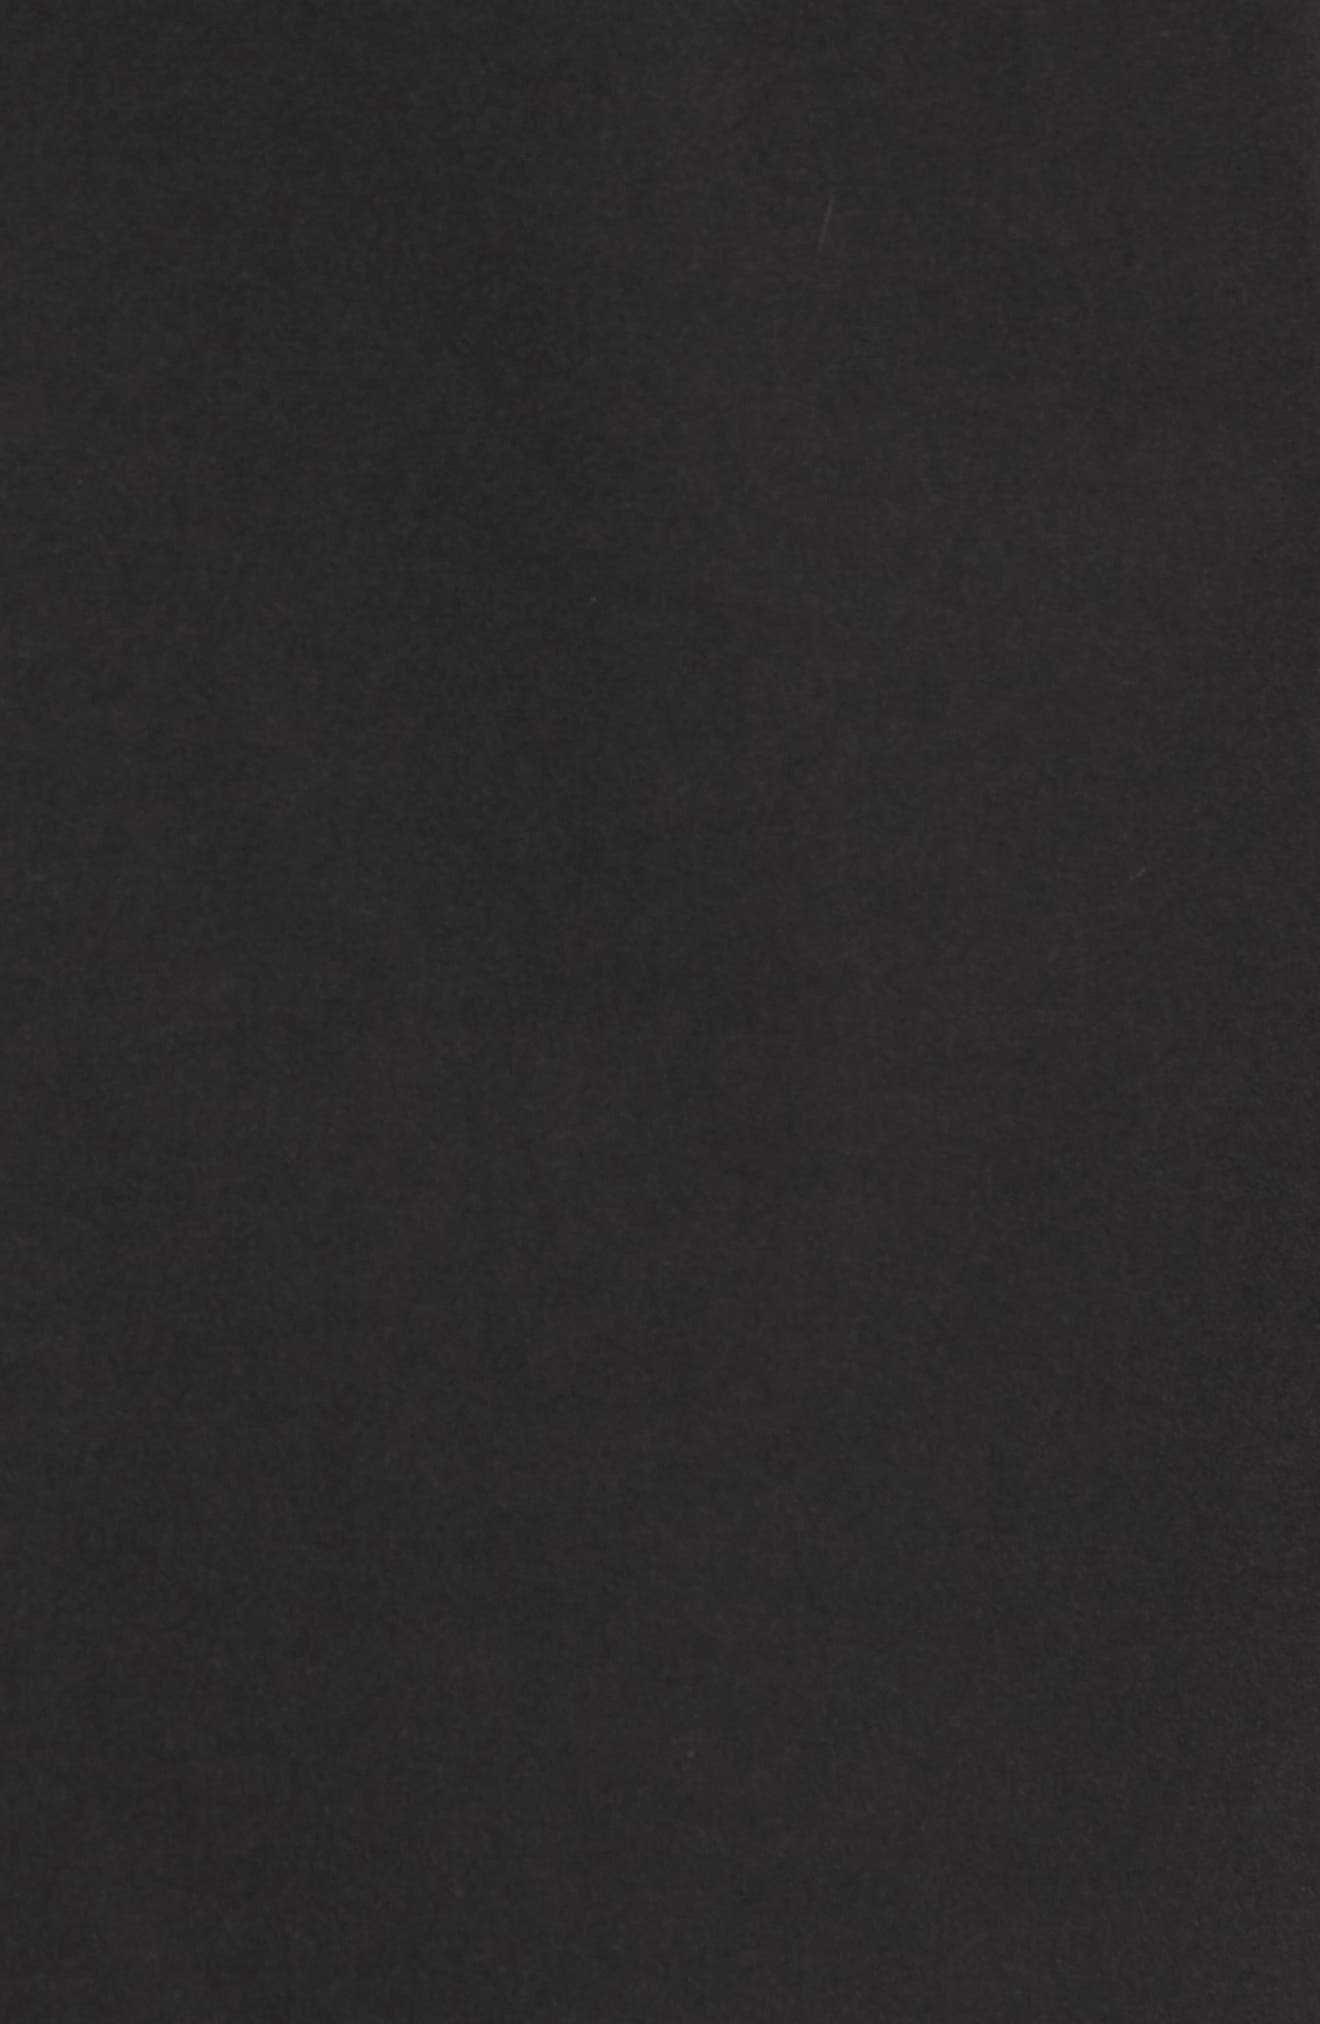 Clyde Hill Waterproof Field Jacket,                             Alternate thumbnail 5, color,                             Black